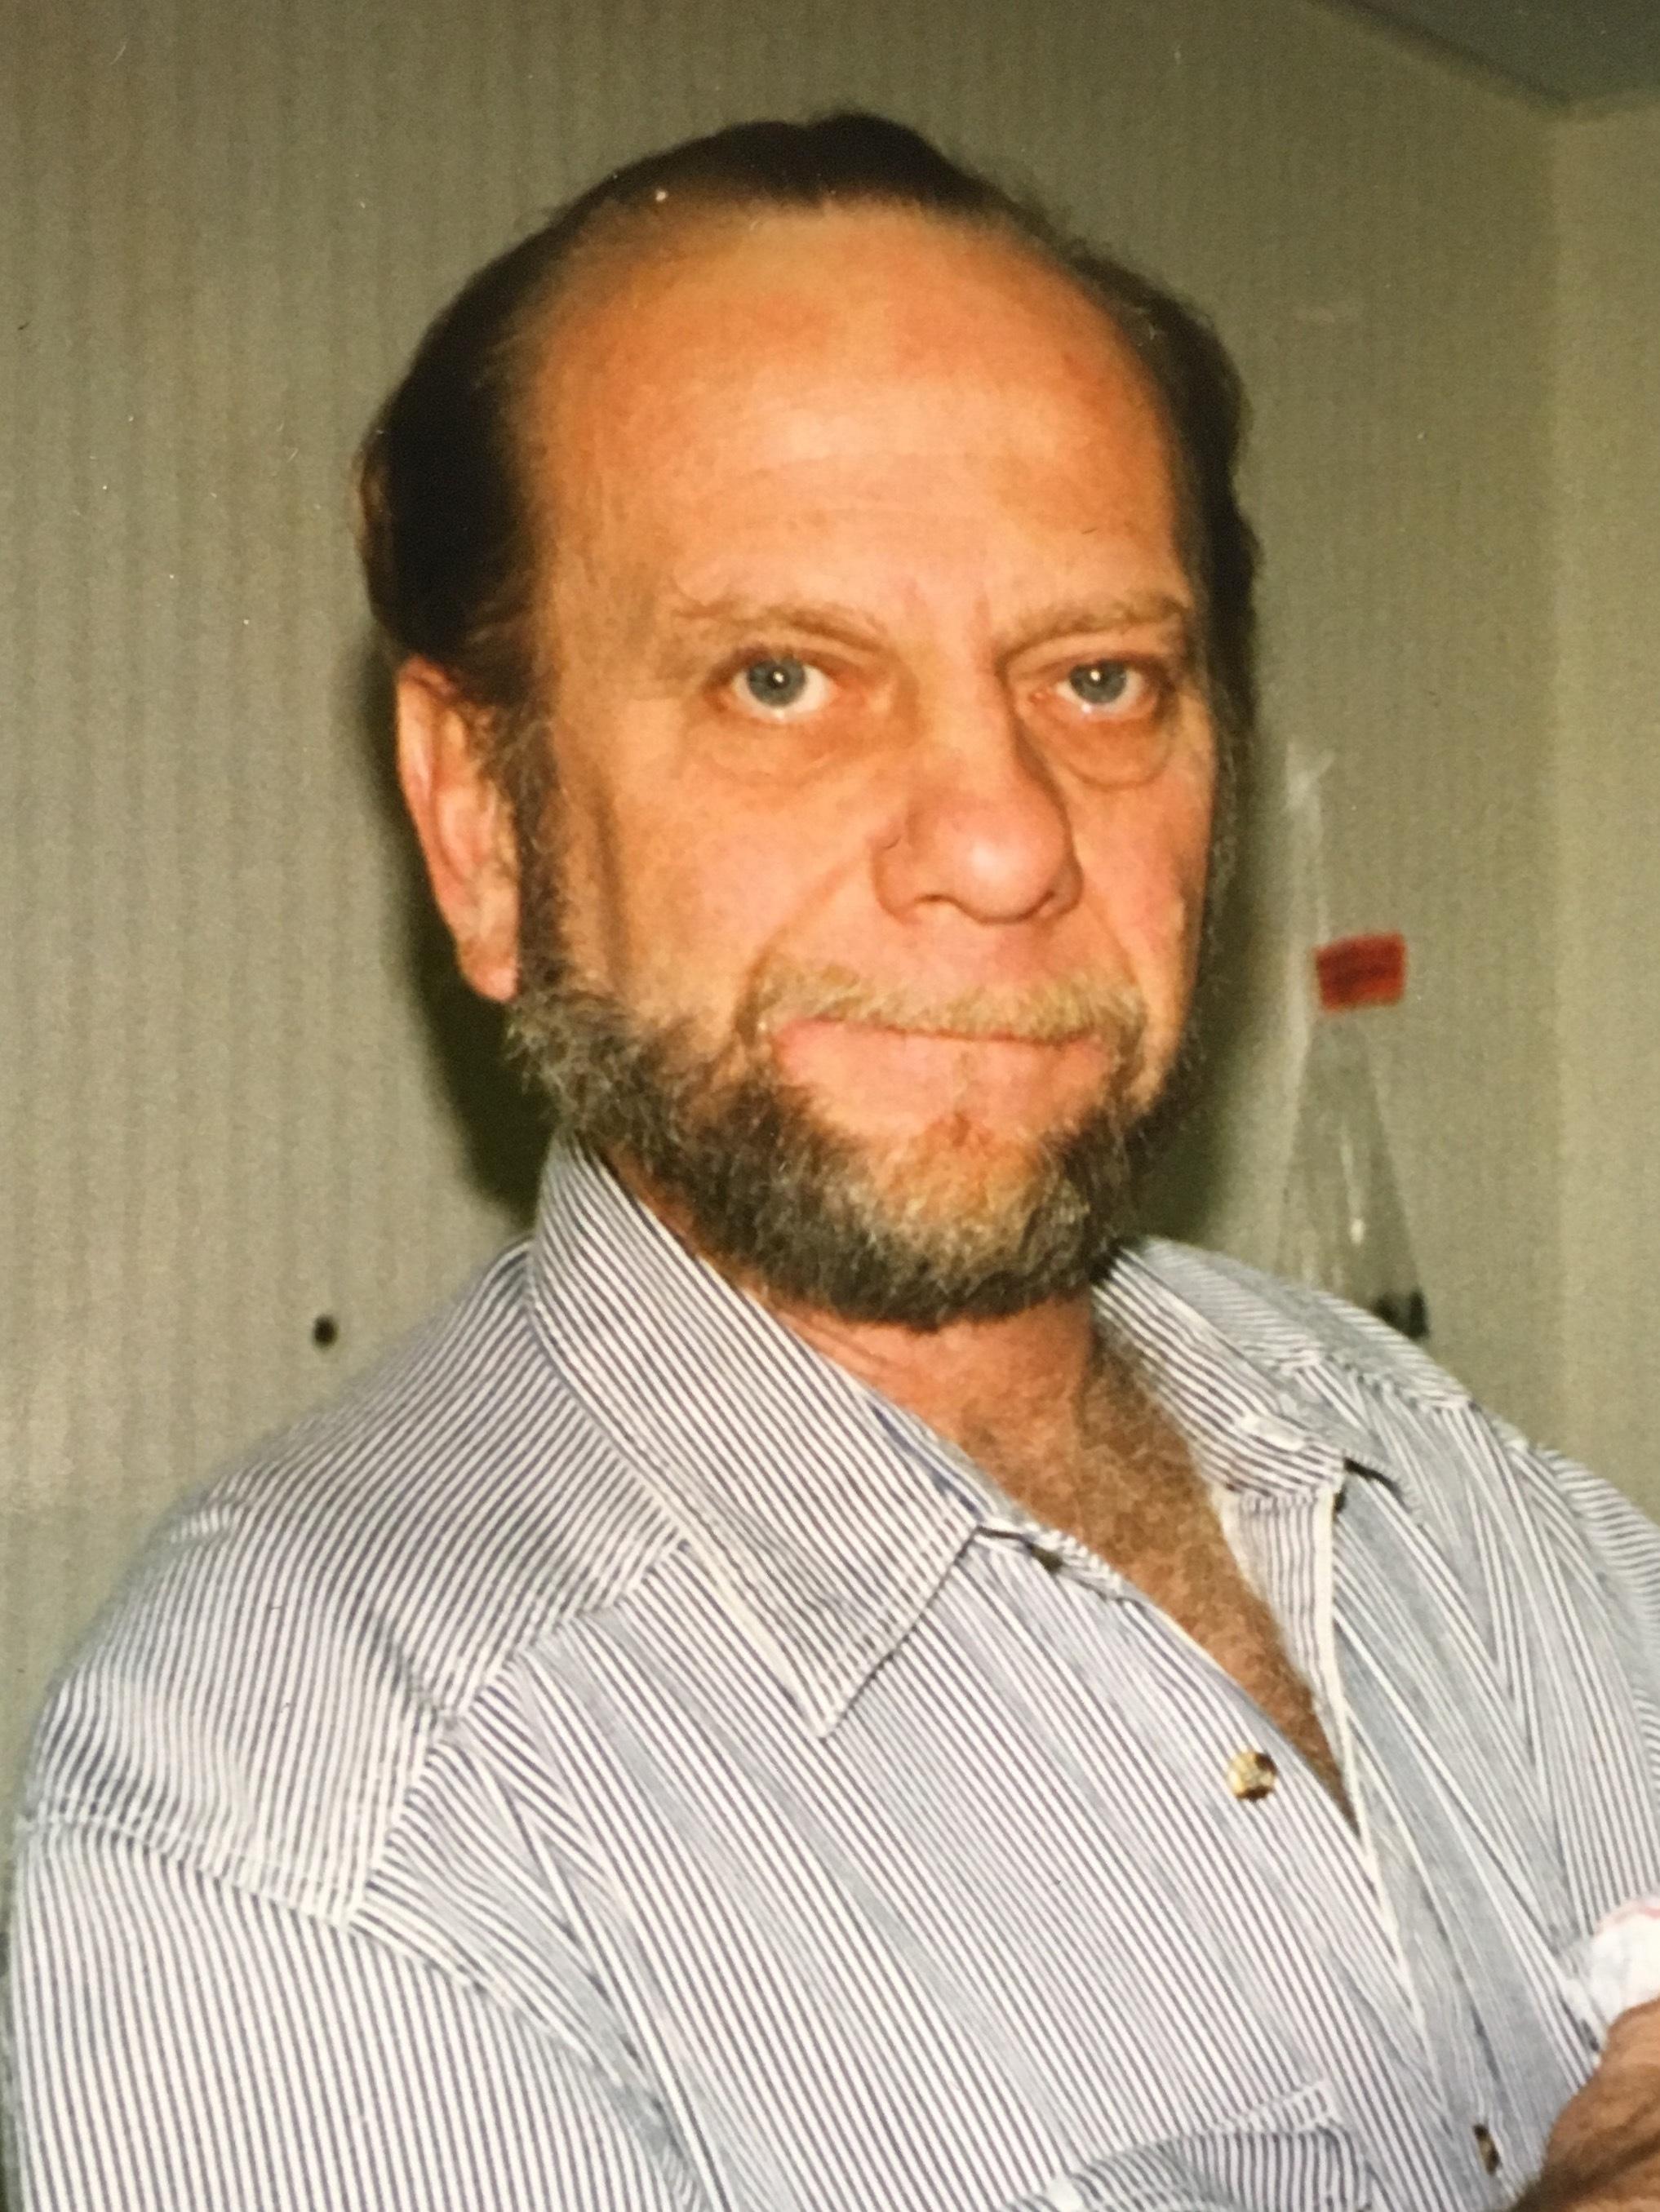 Paul Honrychs